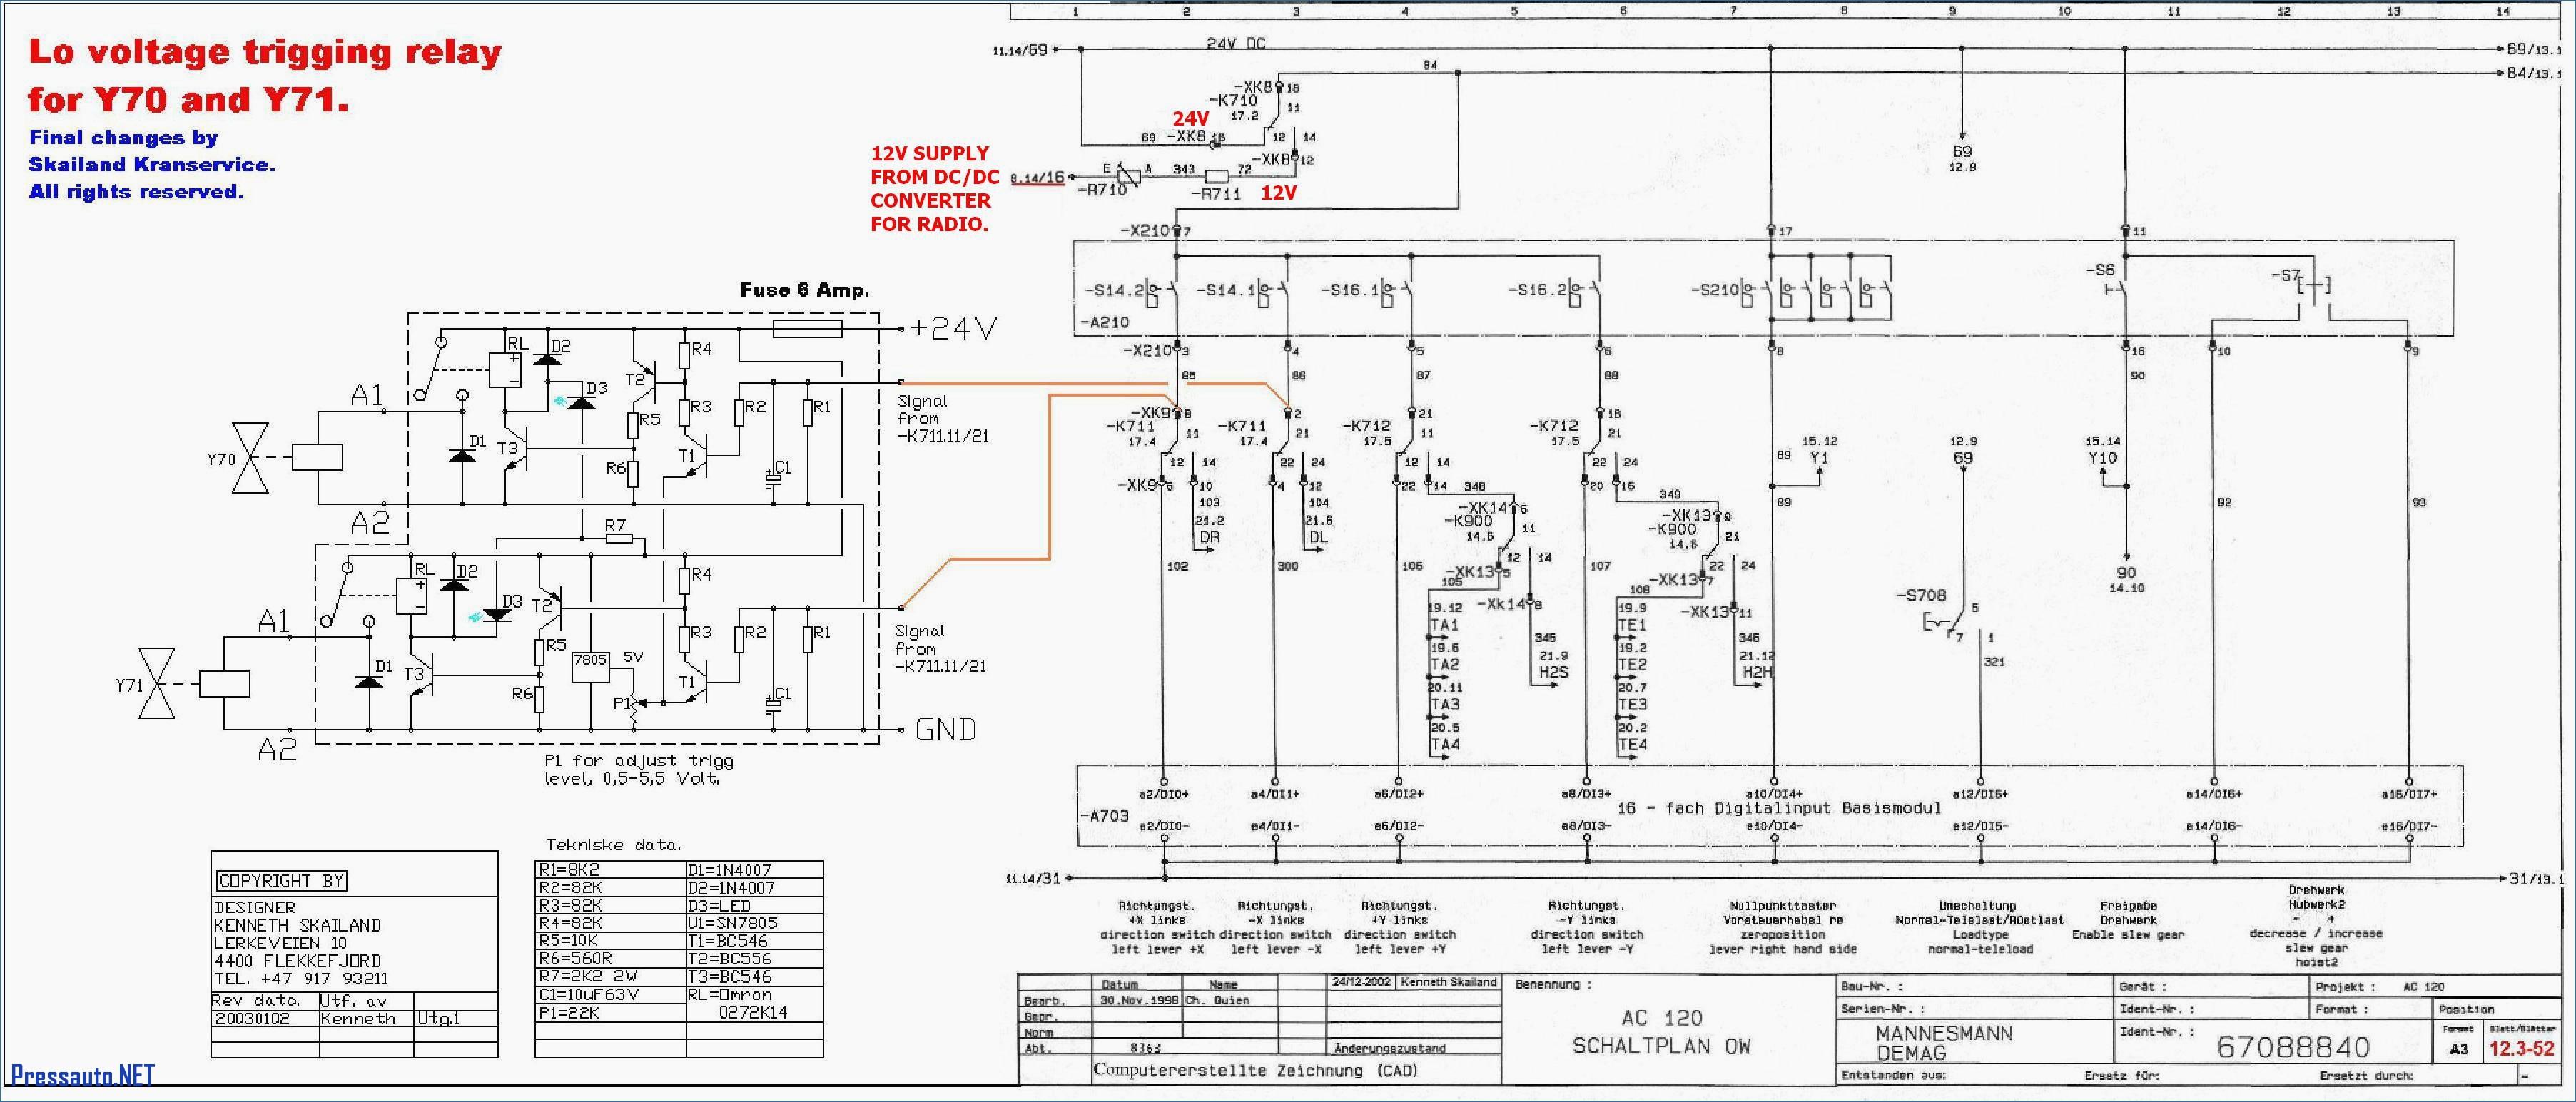 overhead crane wiring diagram Download-Abb Vfd Wiring Diagram Demag Crane  Free Image About With